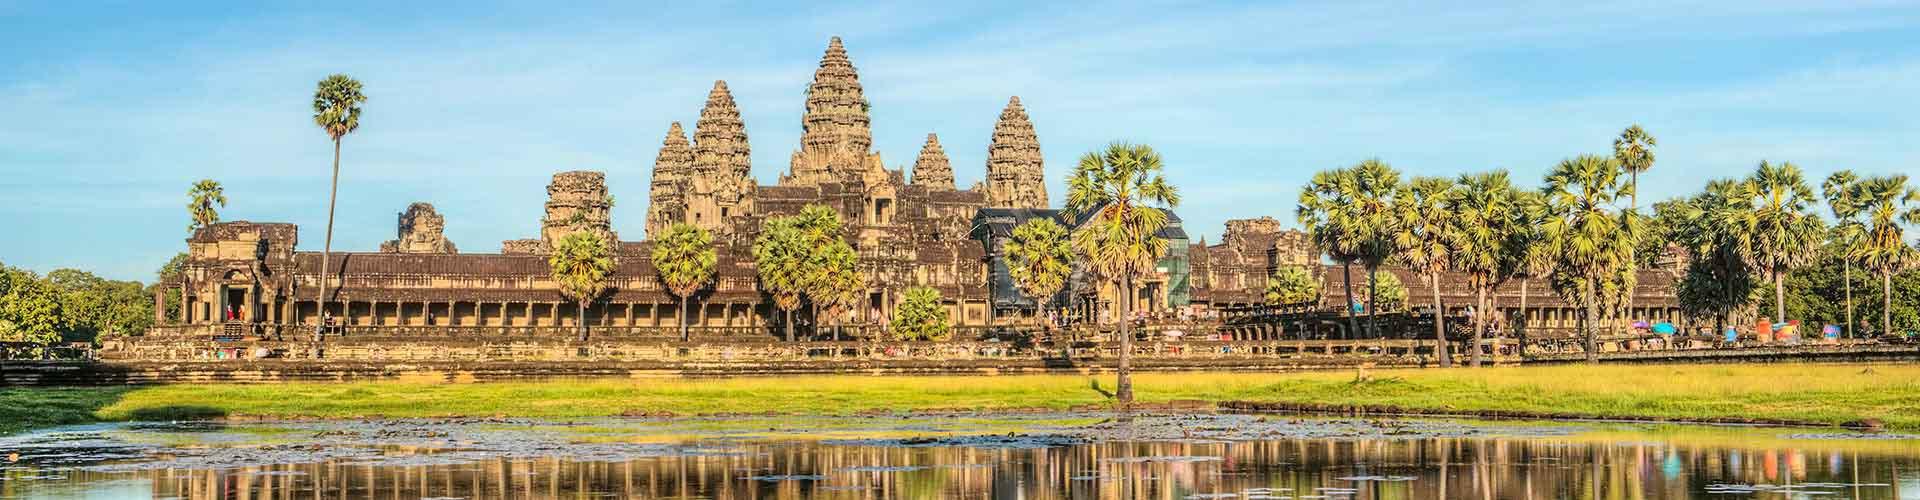 Siem Reap - pokoje v Siem Reap. Mapy pro Siem Reap, fotky a recenze pro každý pokoj - Siem Reap.